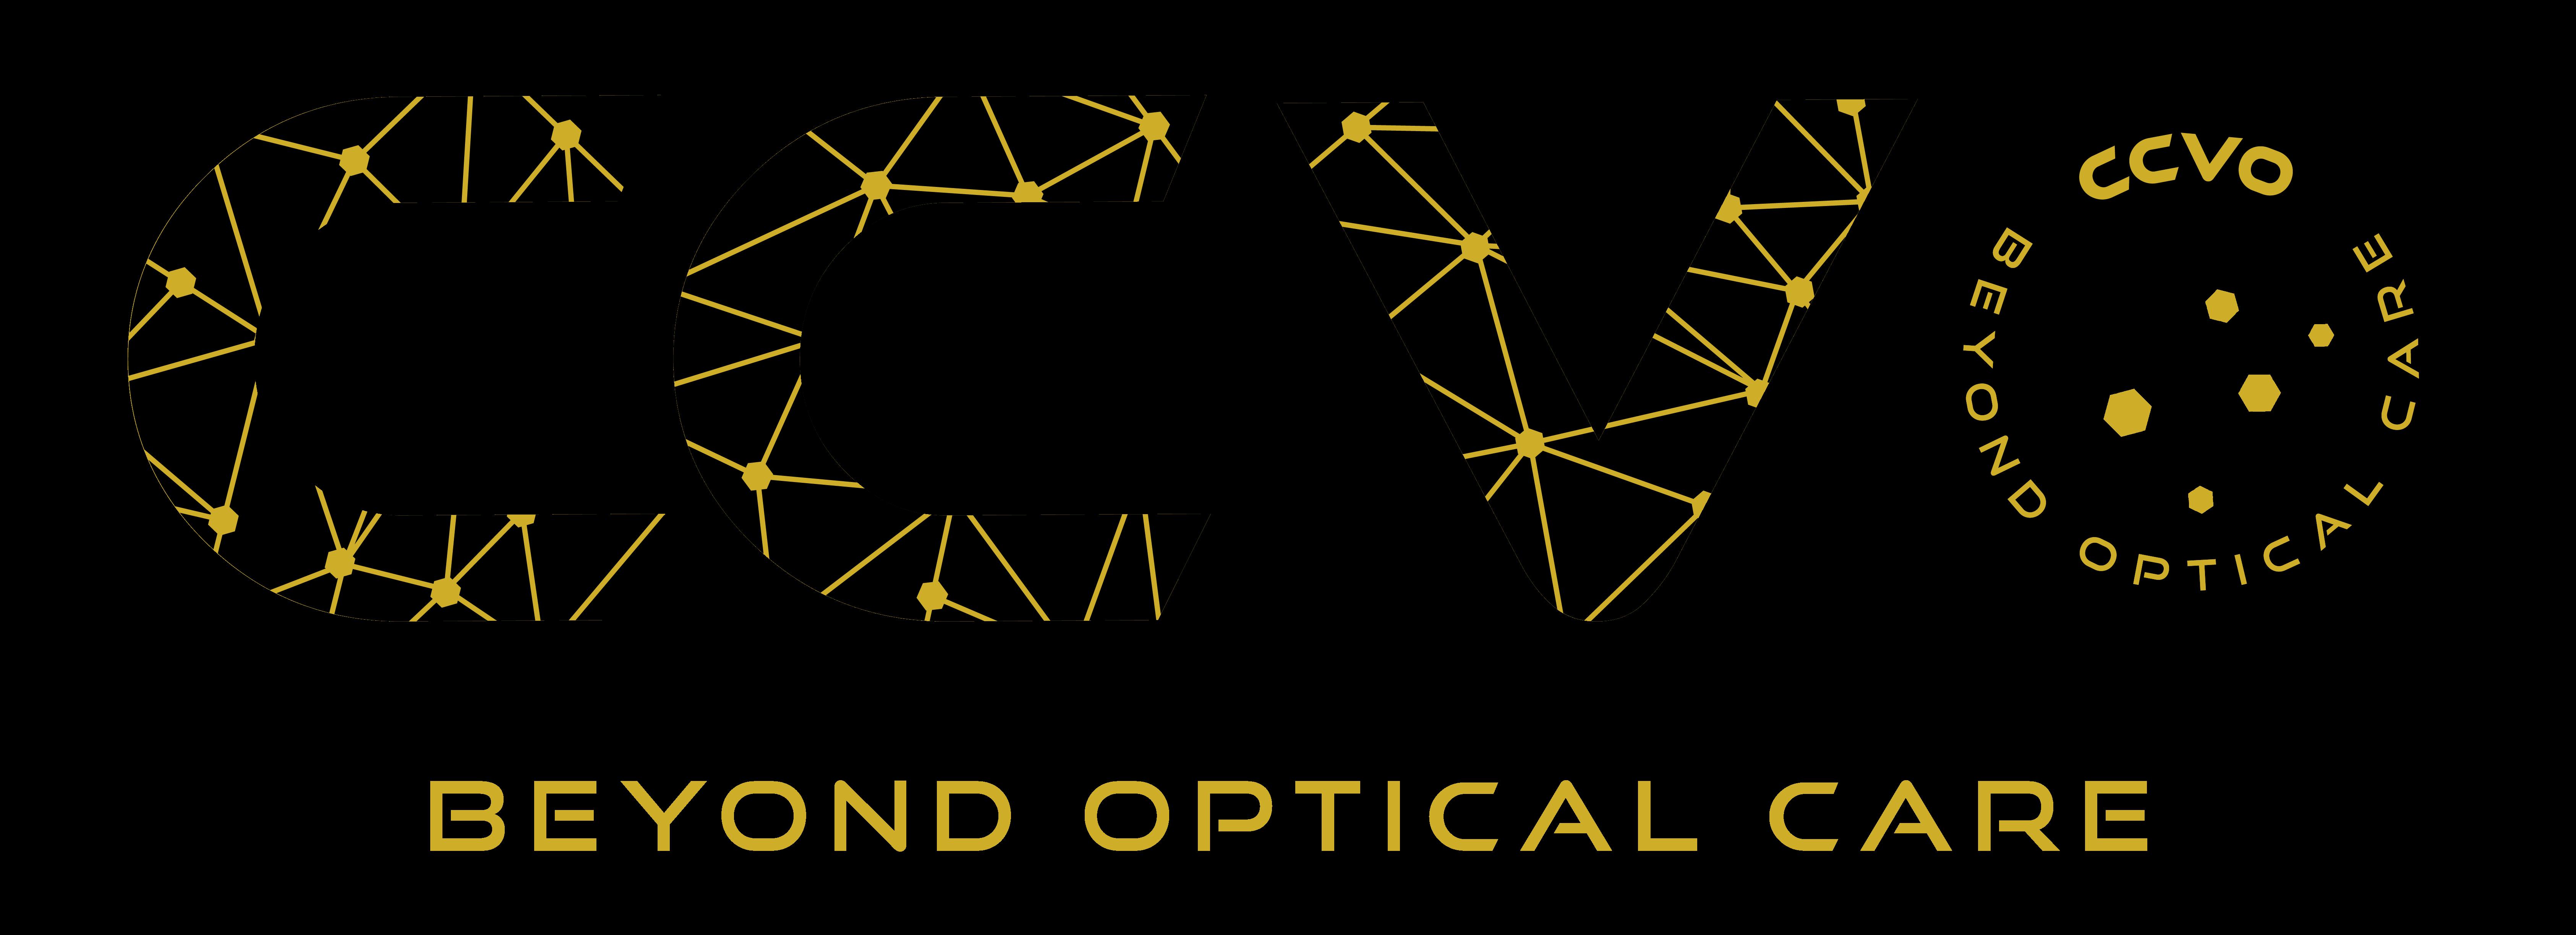 CCVO - Beyond Optical Care